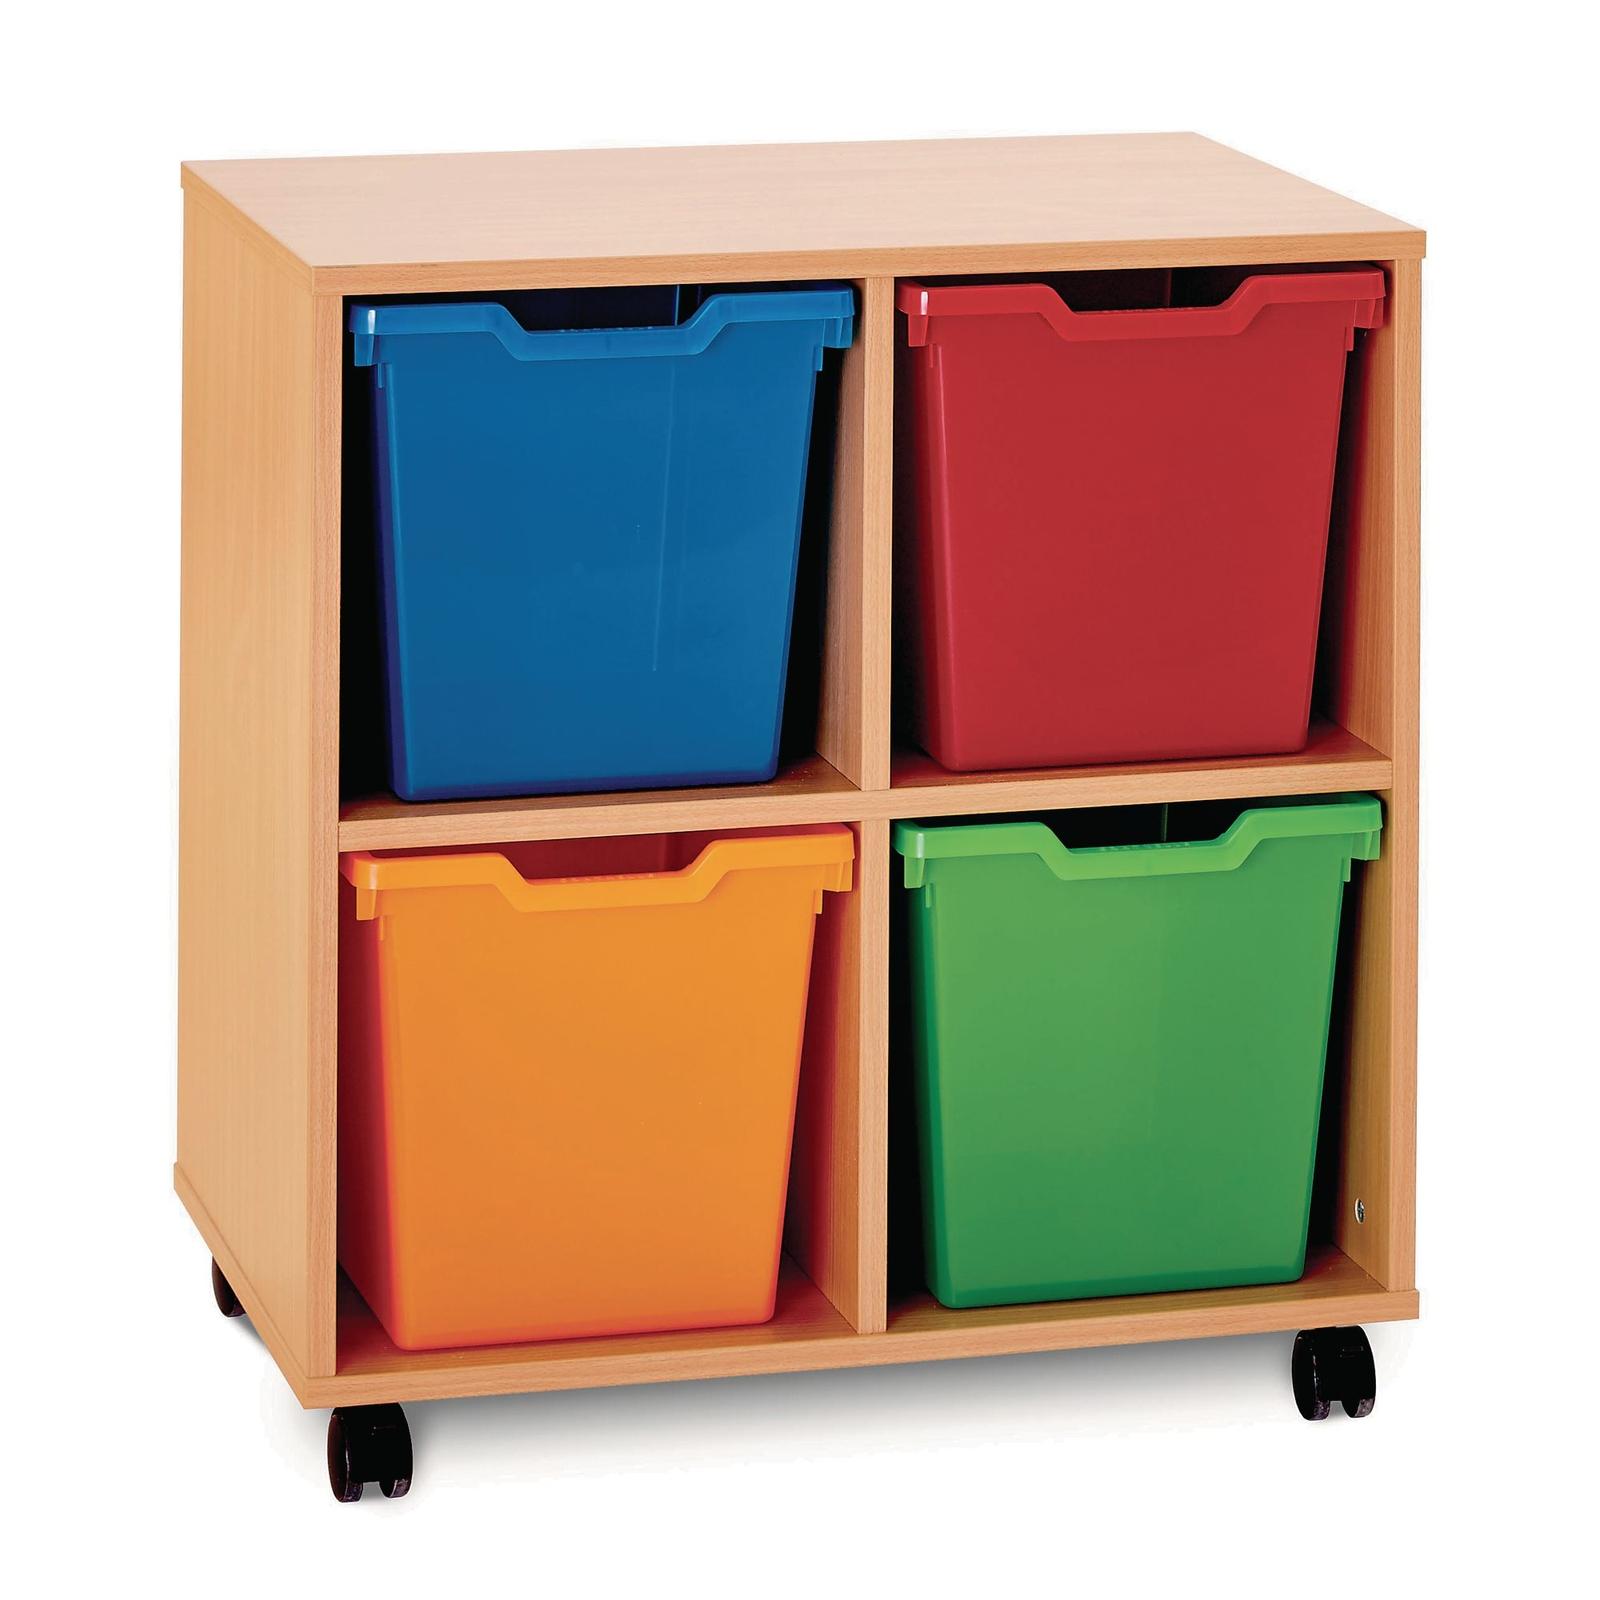 4 Jumbo Tray Unit - Maple Unit - Assorted Trays Included